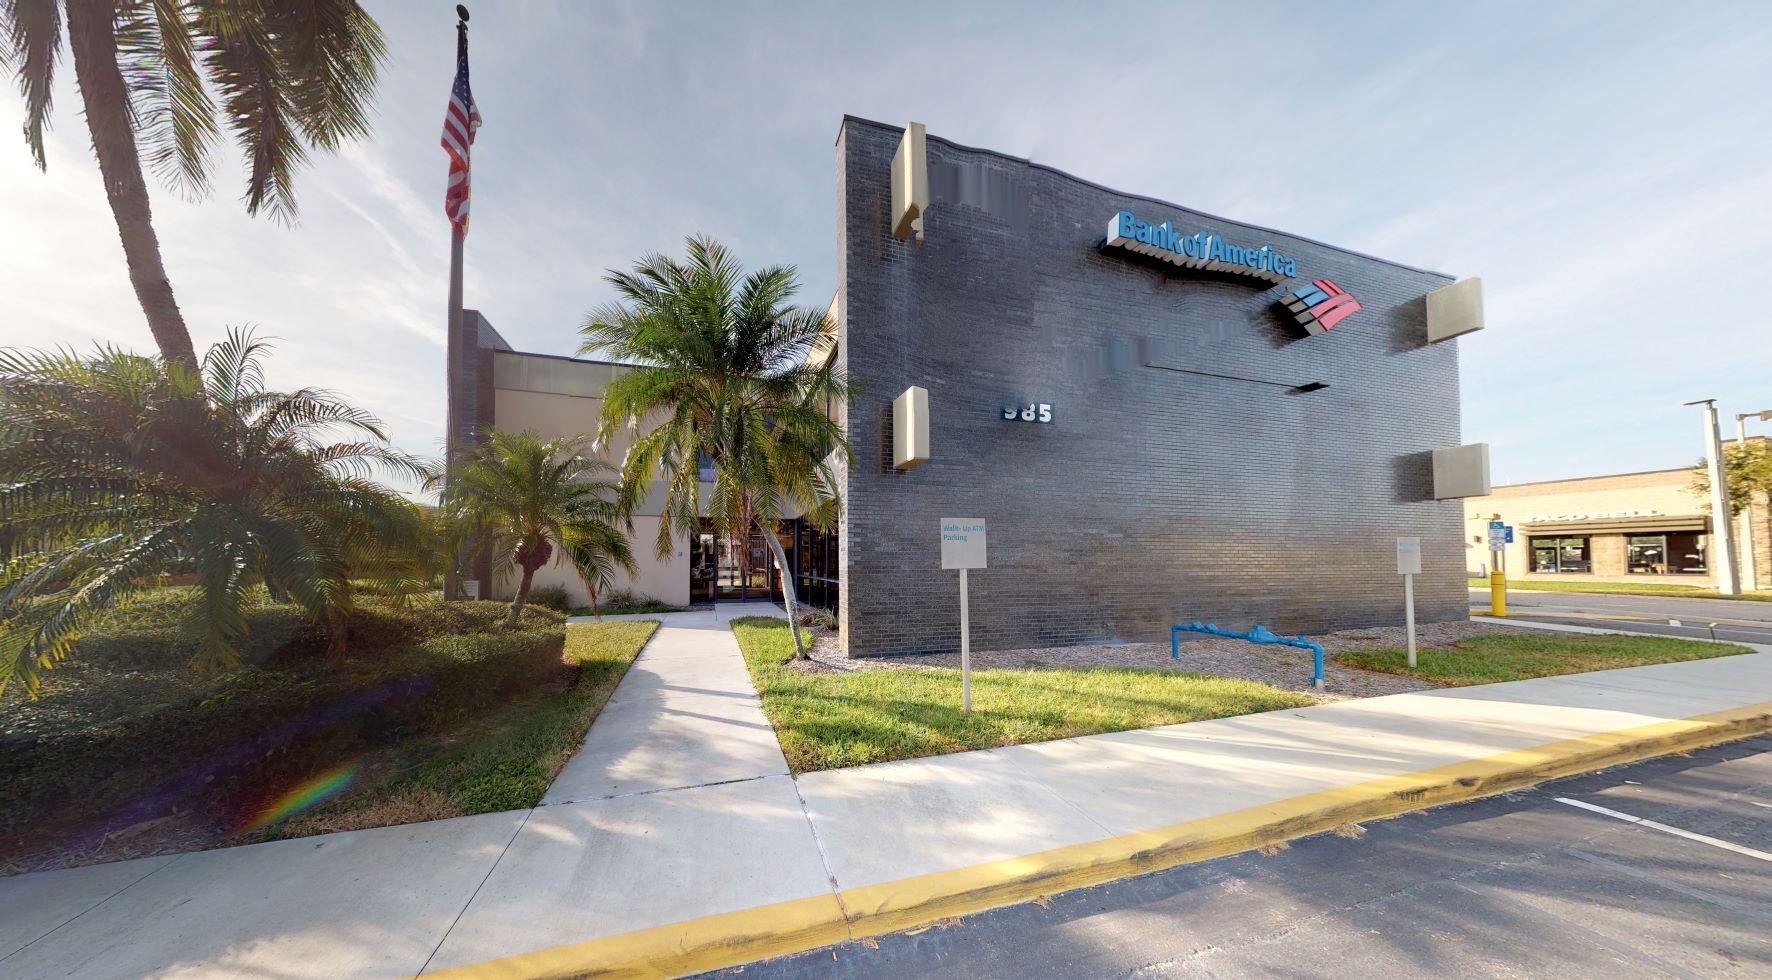 Bank of America financial center with drive-thru ATM   985 Pasadena Ave S, South Pasadena, FL 33707